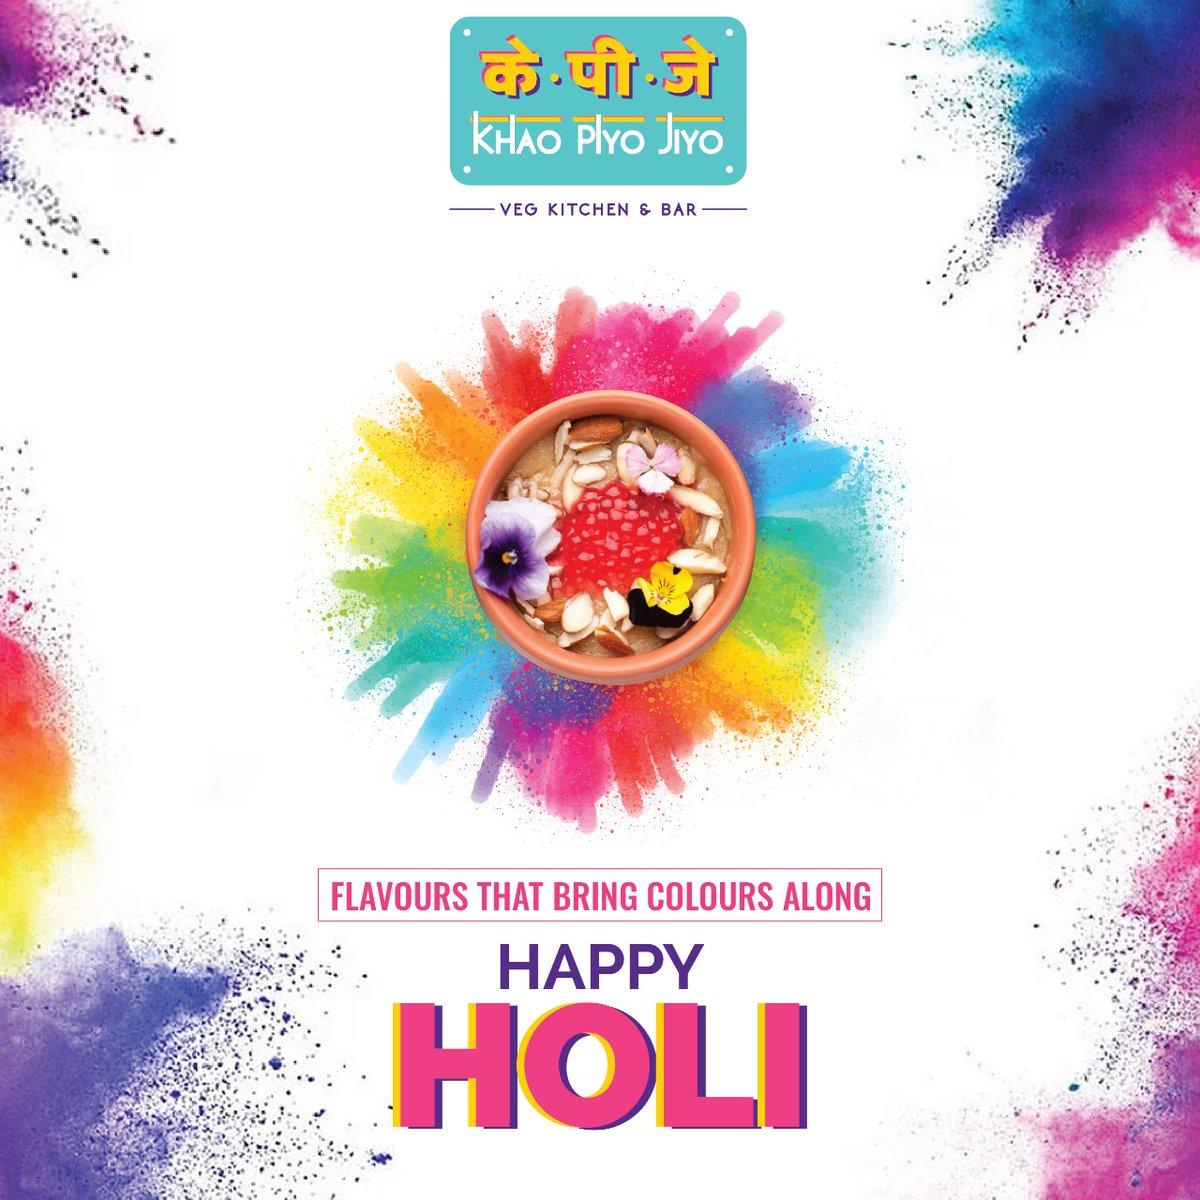 Holi Khele Raghuveera? Wish you all a very happy, vibrant and safe Holi. Let's celebrate a lifetime of colours and joy! . . . #khaopiyojiyo #happyholi #flavours #holicelebration #colour #things2doinmumbai #themumbaiguide #chickenbiryani #mumbaieats #foodtalkindia #foodtalkmumbai pic.twitter.com/UWrnXGho90